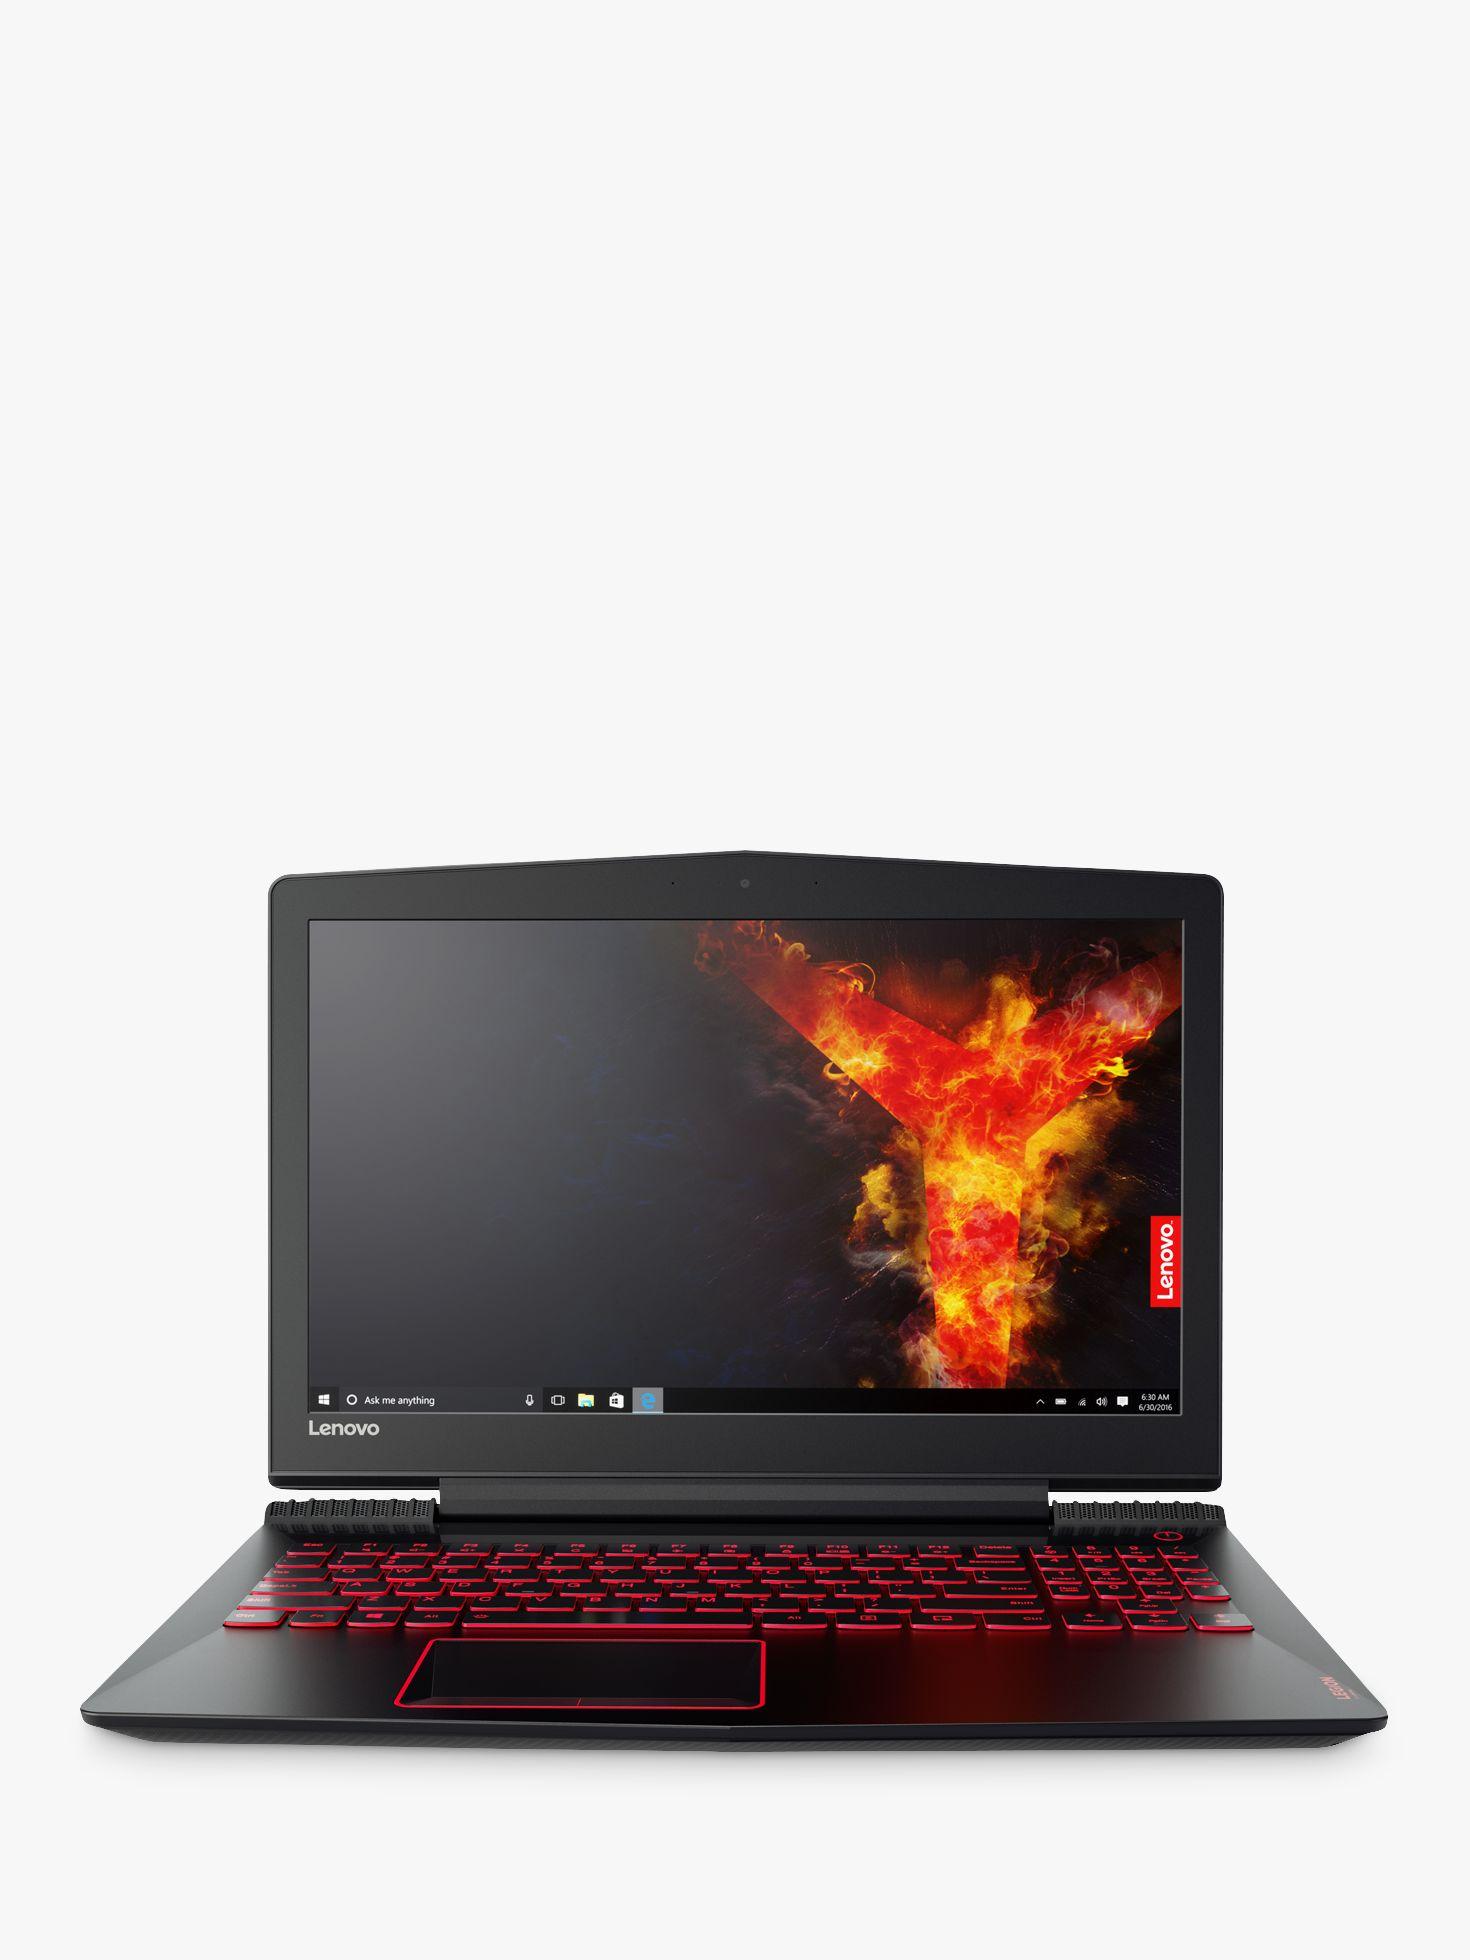 "Lenovo Legion Y520 Laptop, Intel Core i7, 8GB RAM, 1TB HDD + 128SSD, NVIDIA GTX1050, 15.6"" Full HD, Black at John Lewis & Partners"